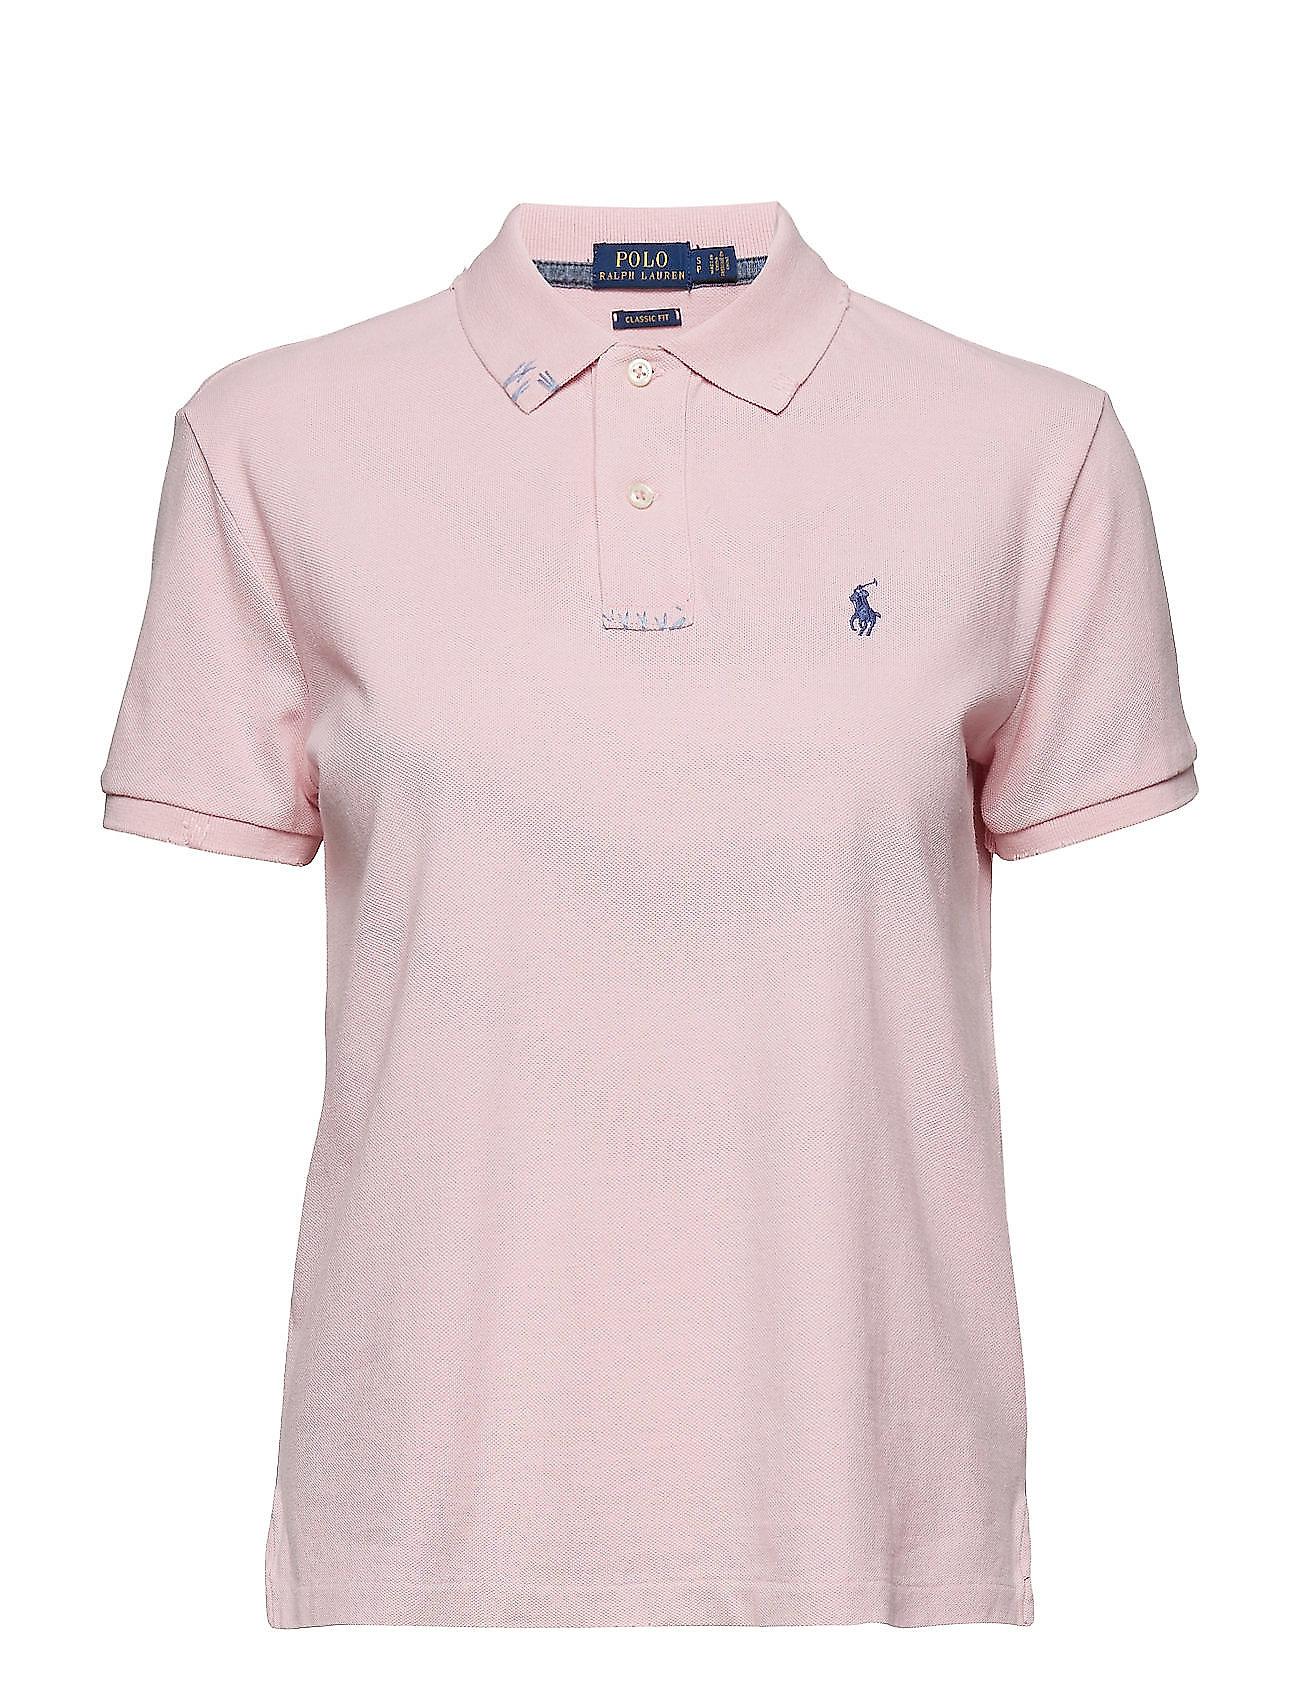 0176421e Classic Fit Cotton Polo Shirt (Resort Pink) (£59.40) - Polo Ralph ...